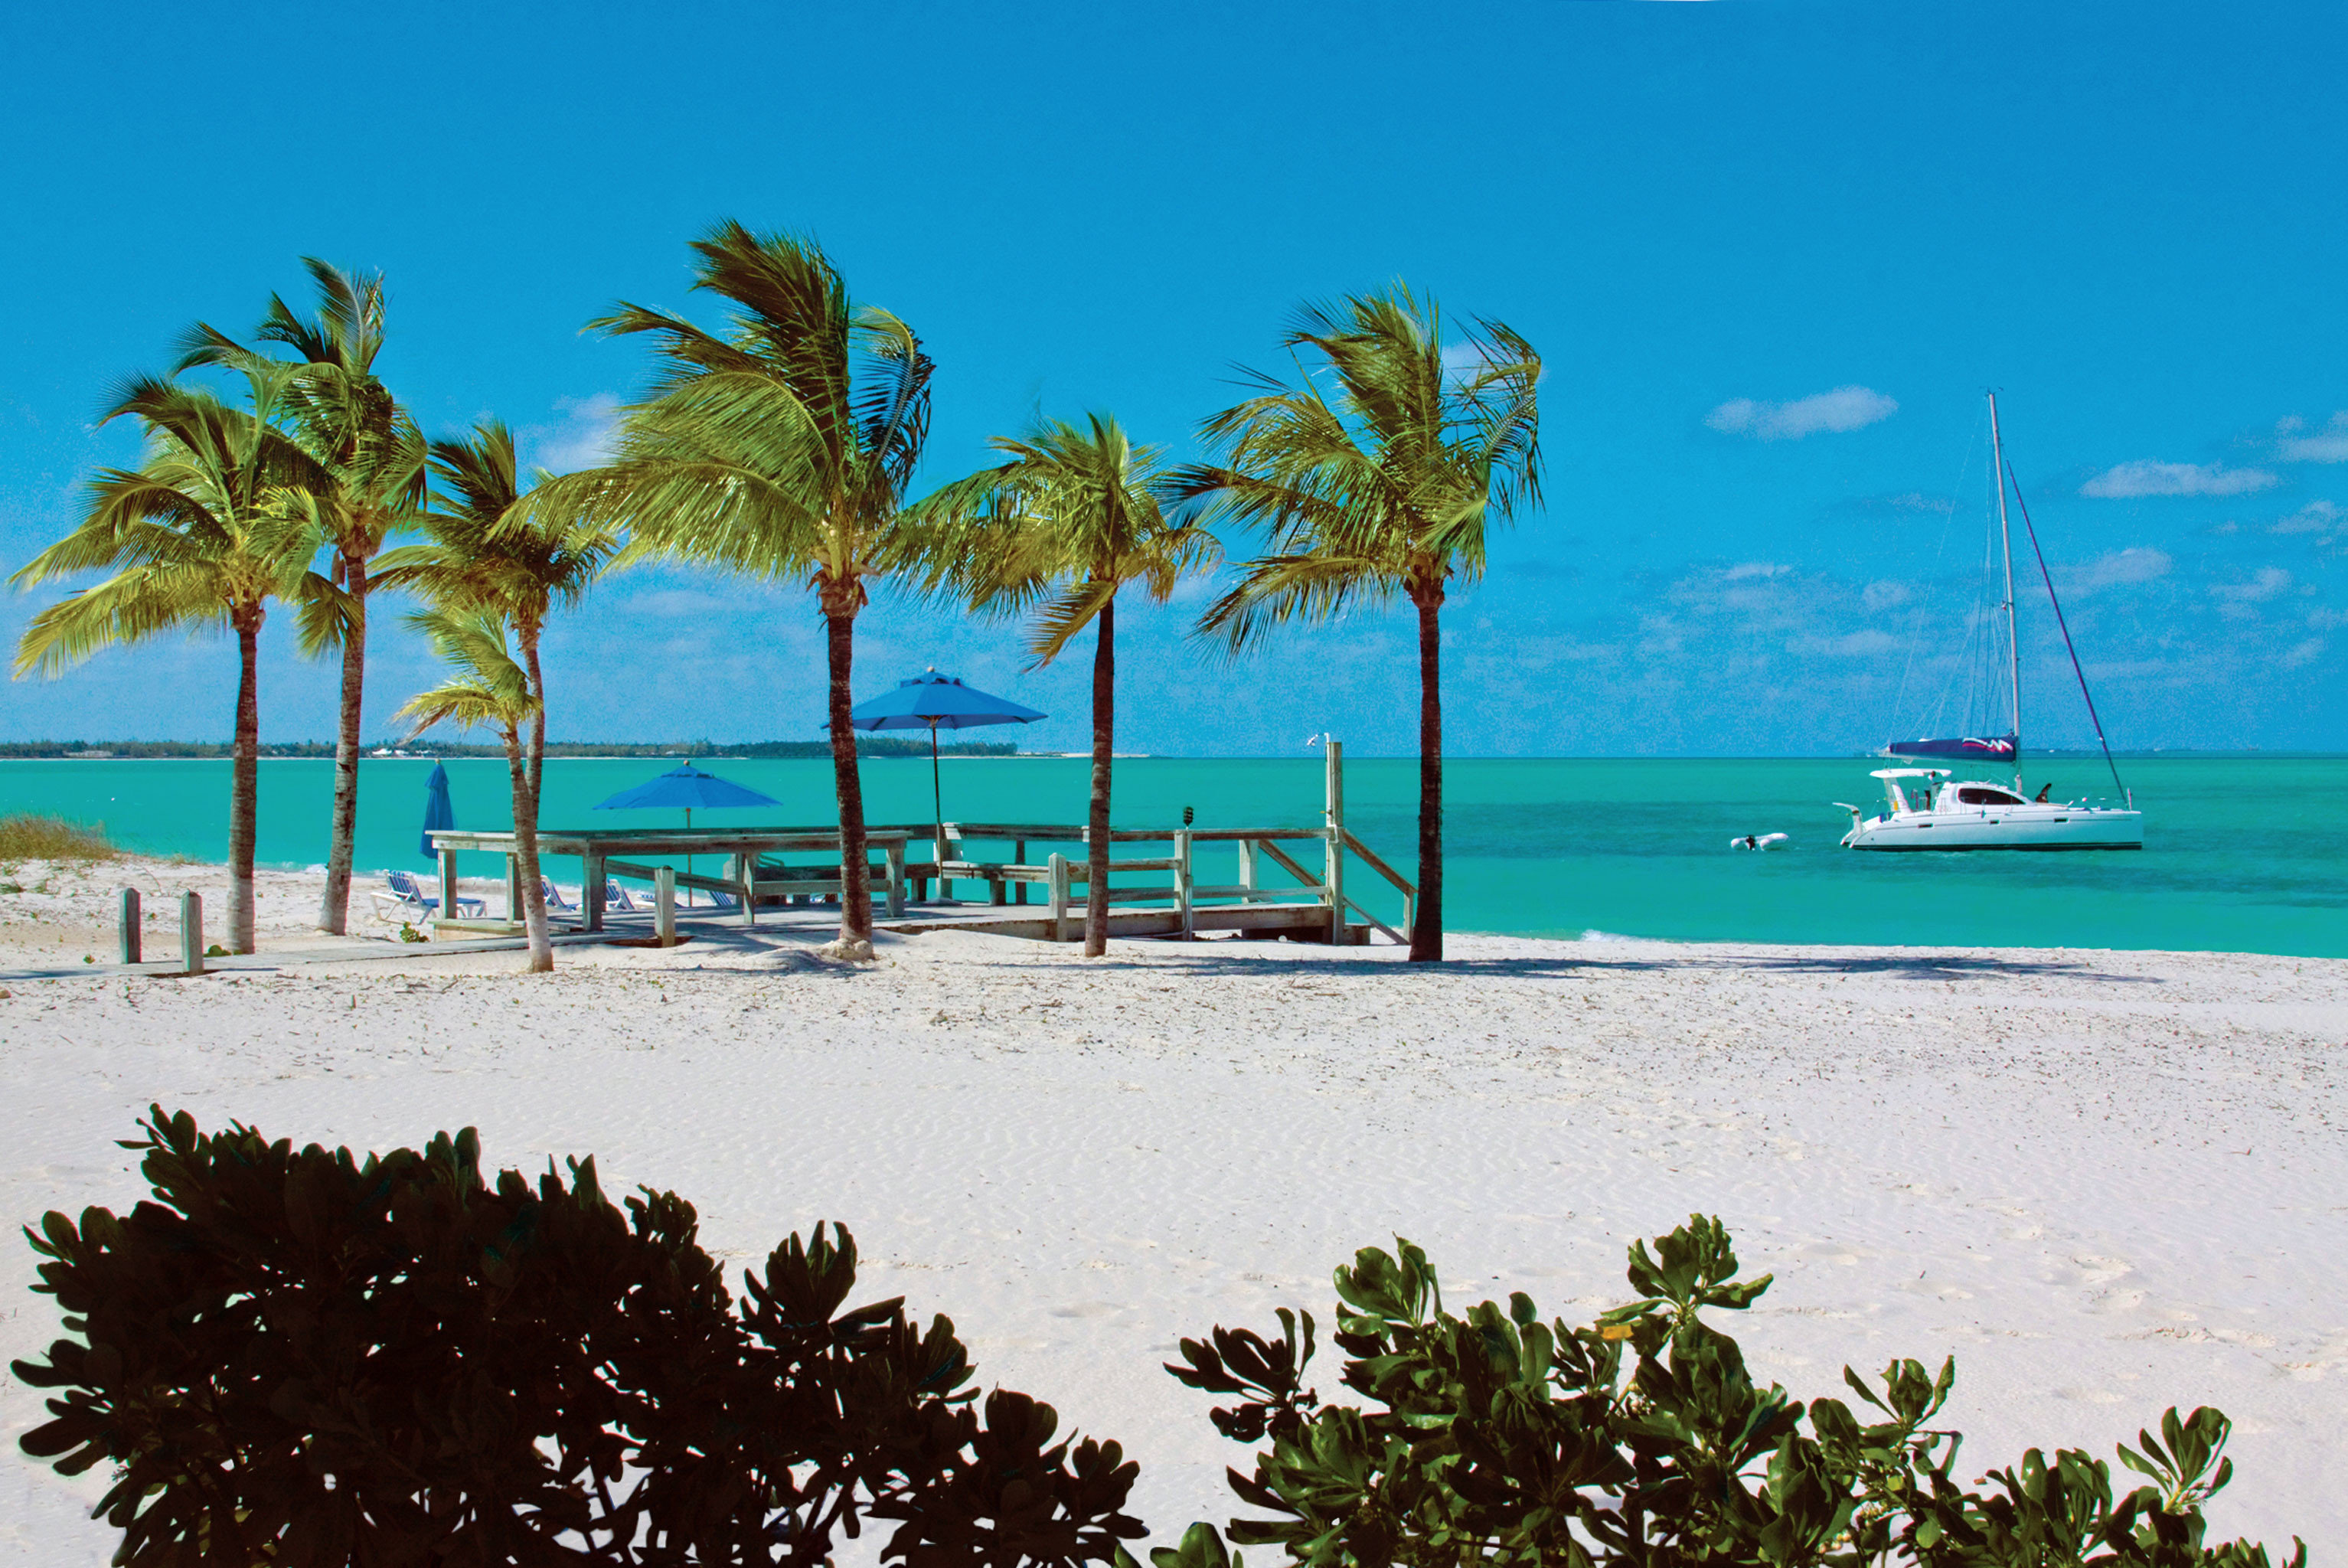 Beach Beachfront Boat Grounds Play Resort tree sky water shore palm Sea caribbean Ocean Coast tropics arecales Lagoon palm family Island cape cay sandy